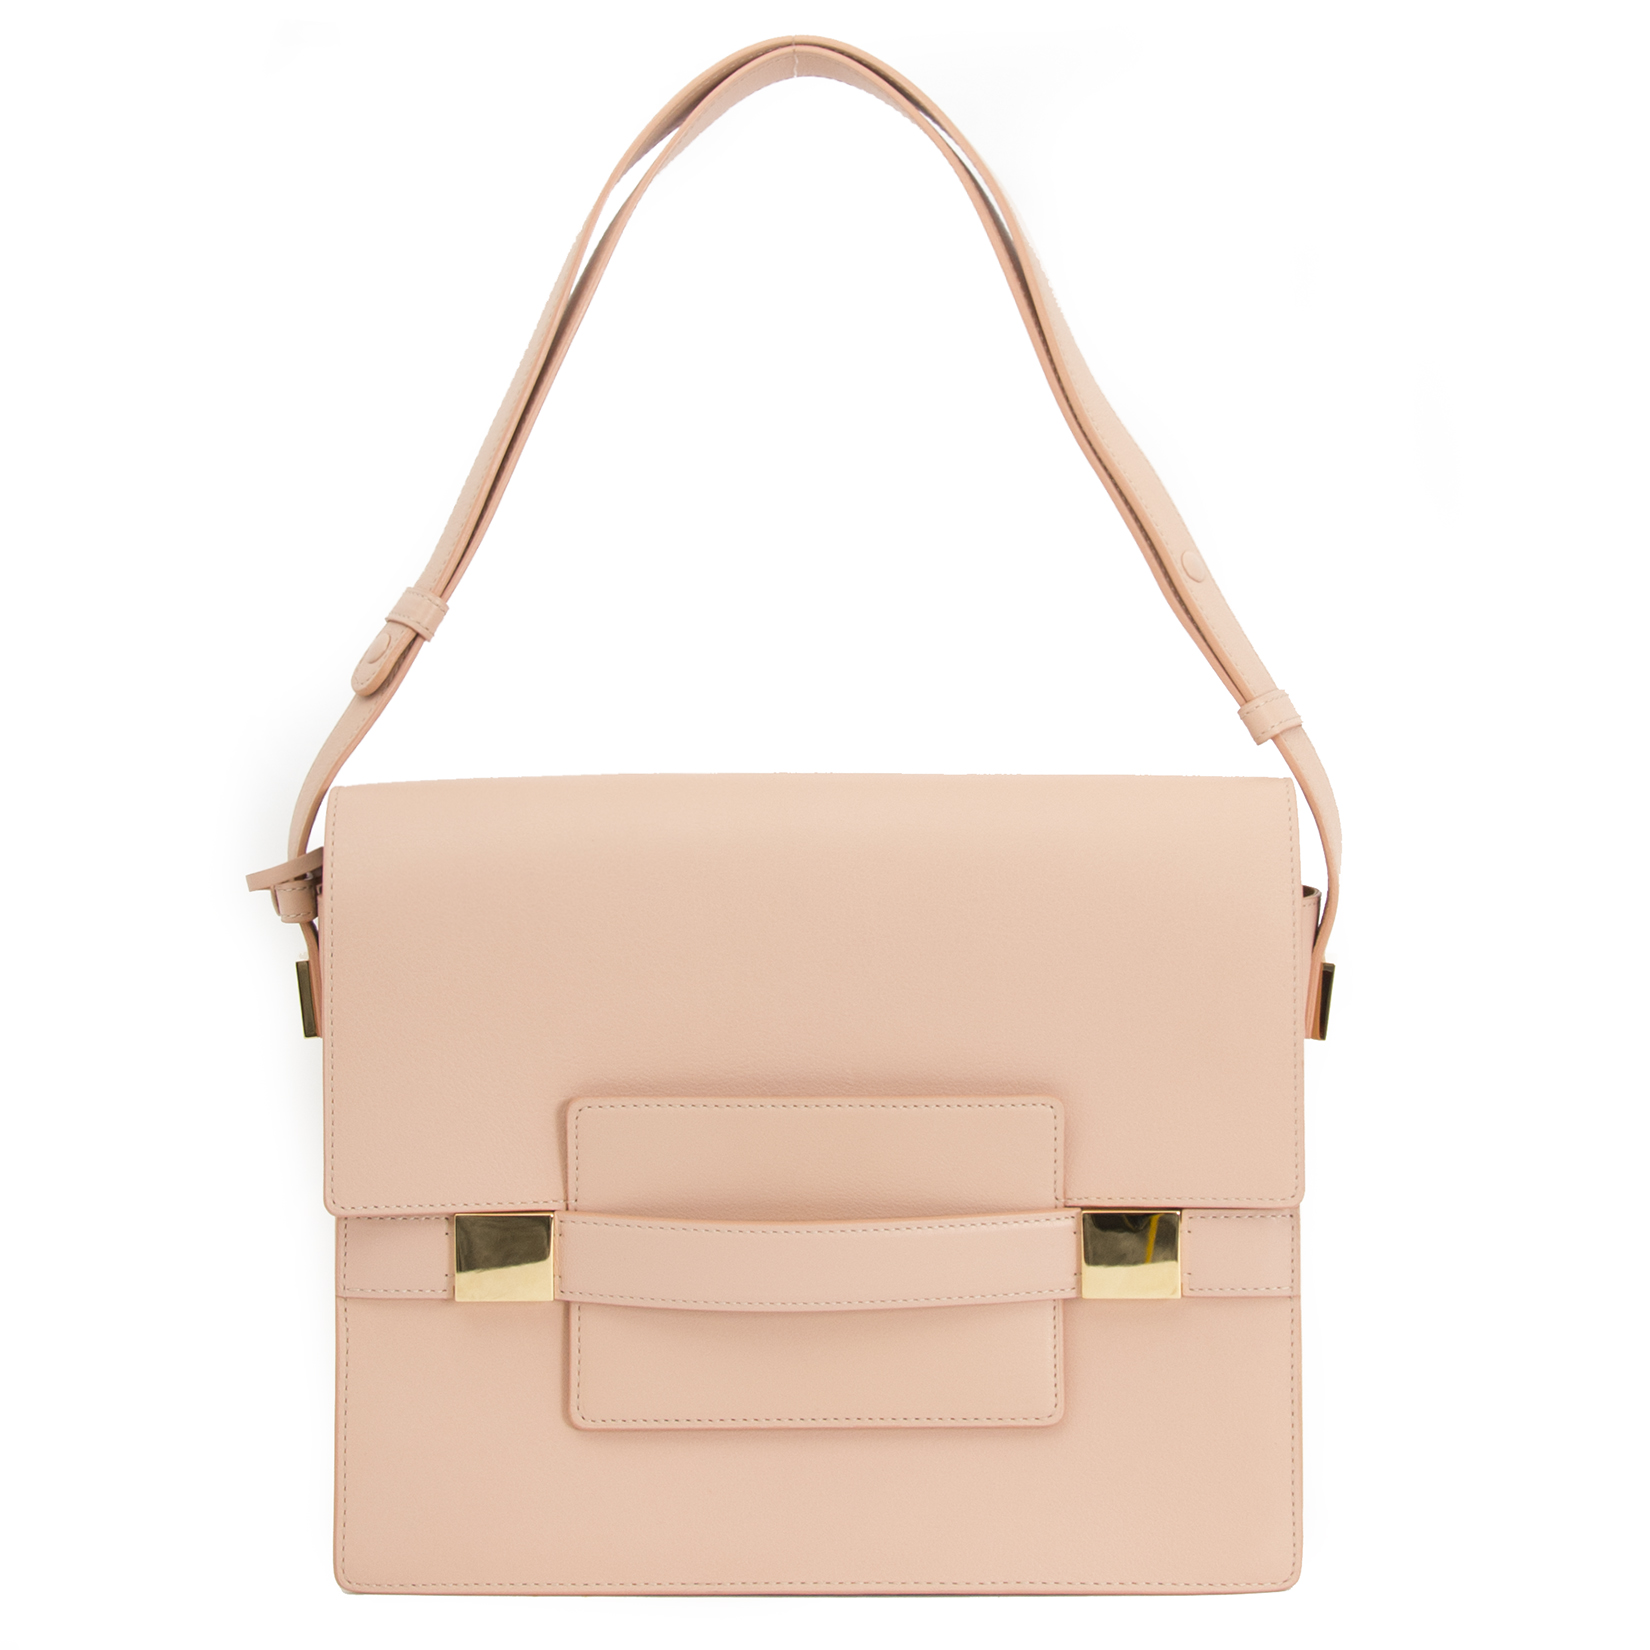 Delvaux Madame GM Rose Polo Shoulder Bag for sale online at Labellov